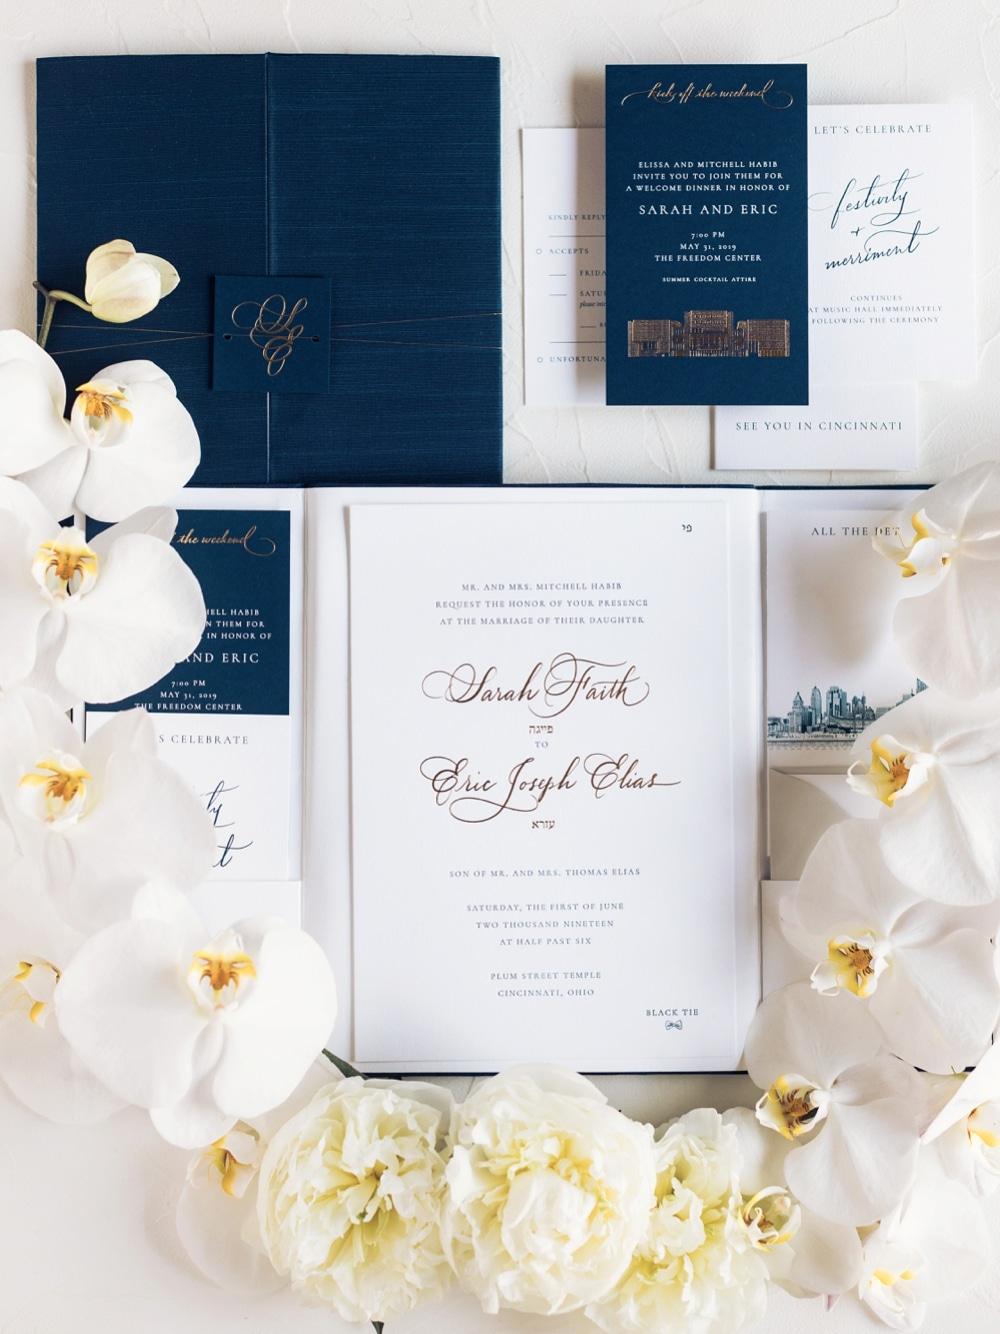 kristin-la-voie-photography-Cincinnati-Music-Hall-Wedding-23